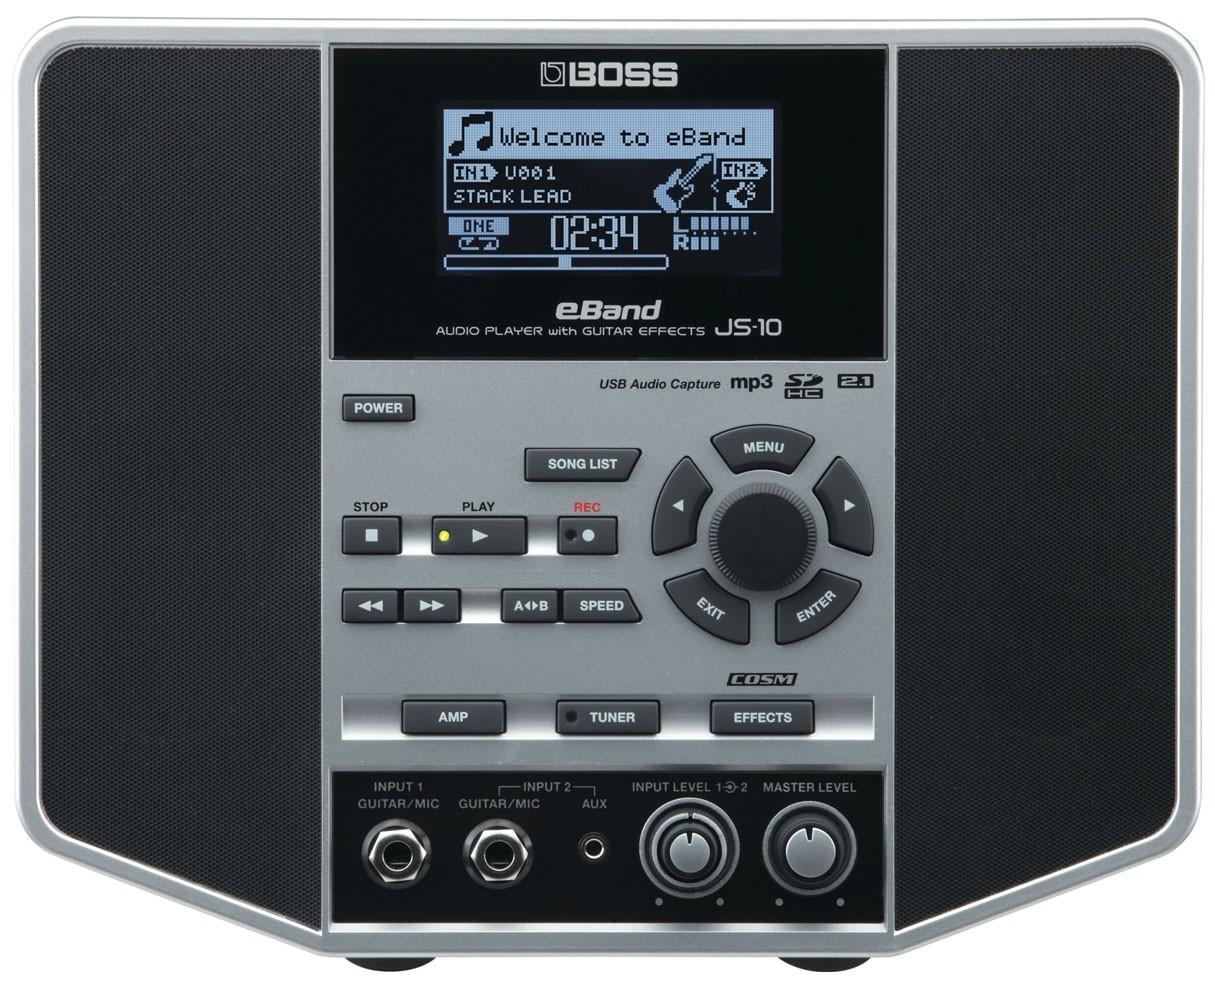 Boss JS-10 eBand JS-10 Audio Player With Guitar Effects B-Stock